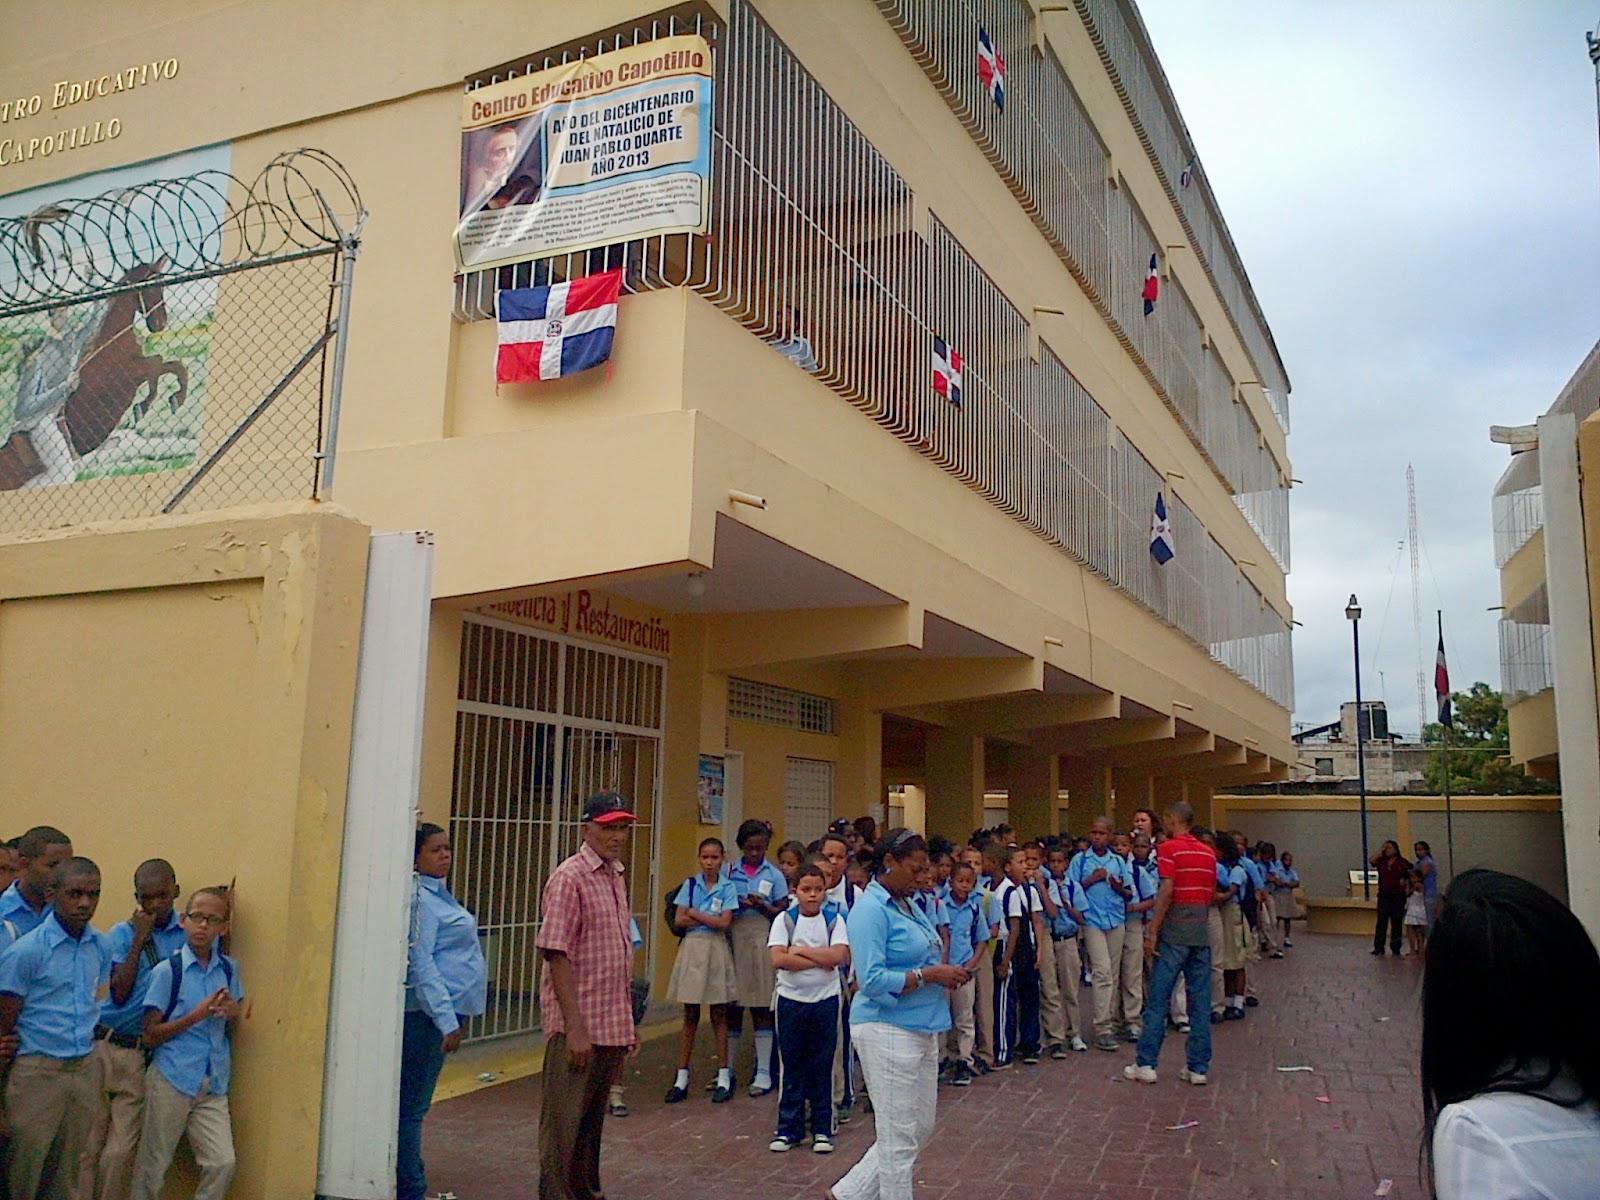 Madres en Capotillo realizan protesta por falta de docencia en escuela